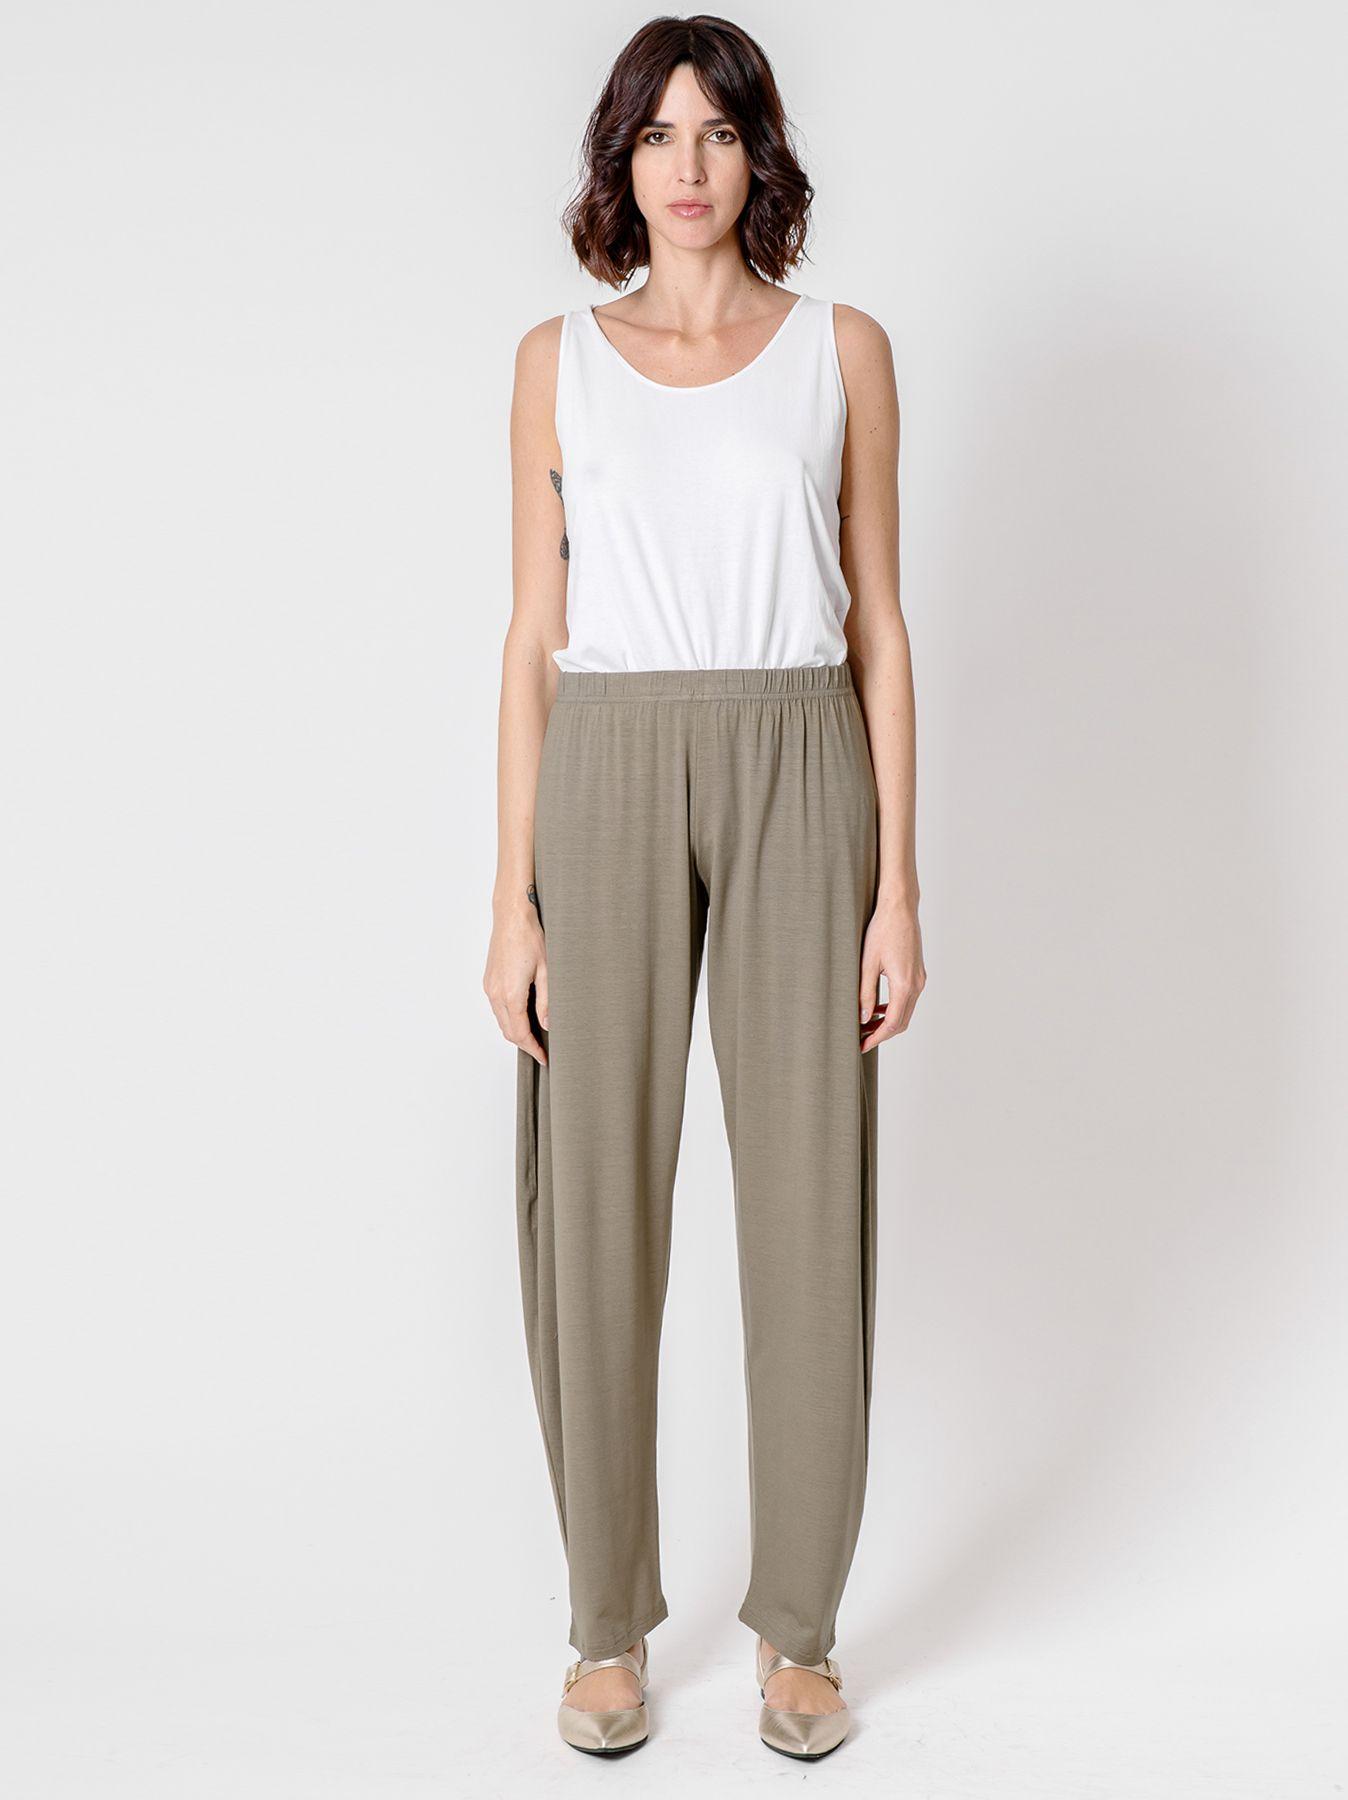 Pantalone anfora